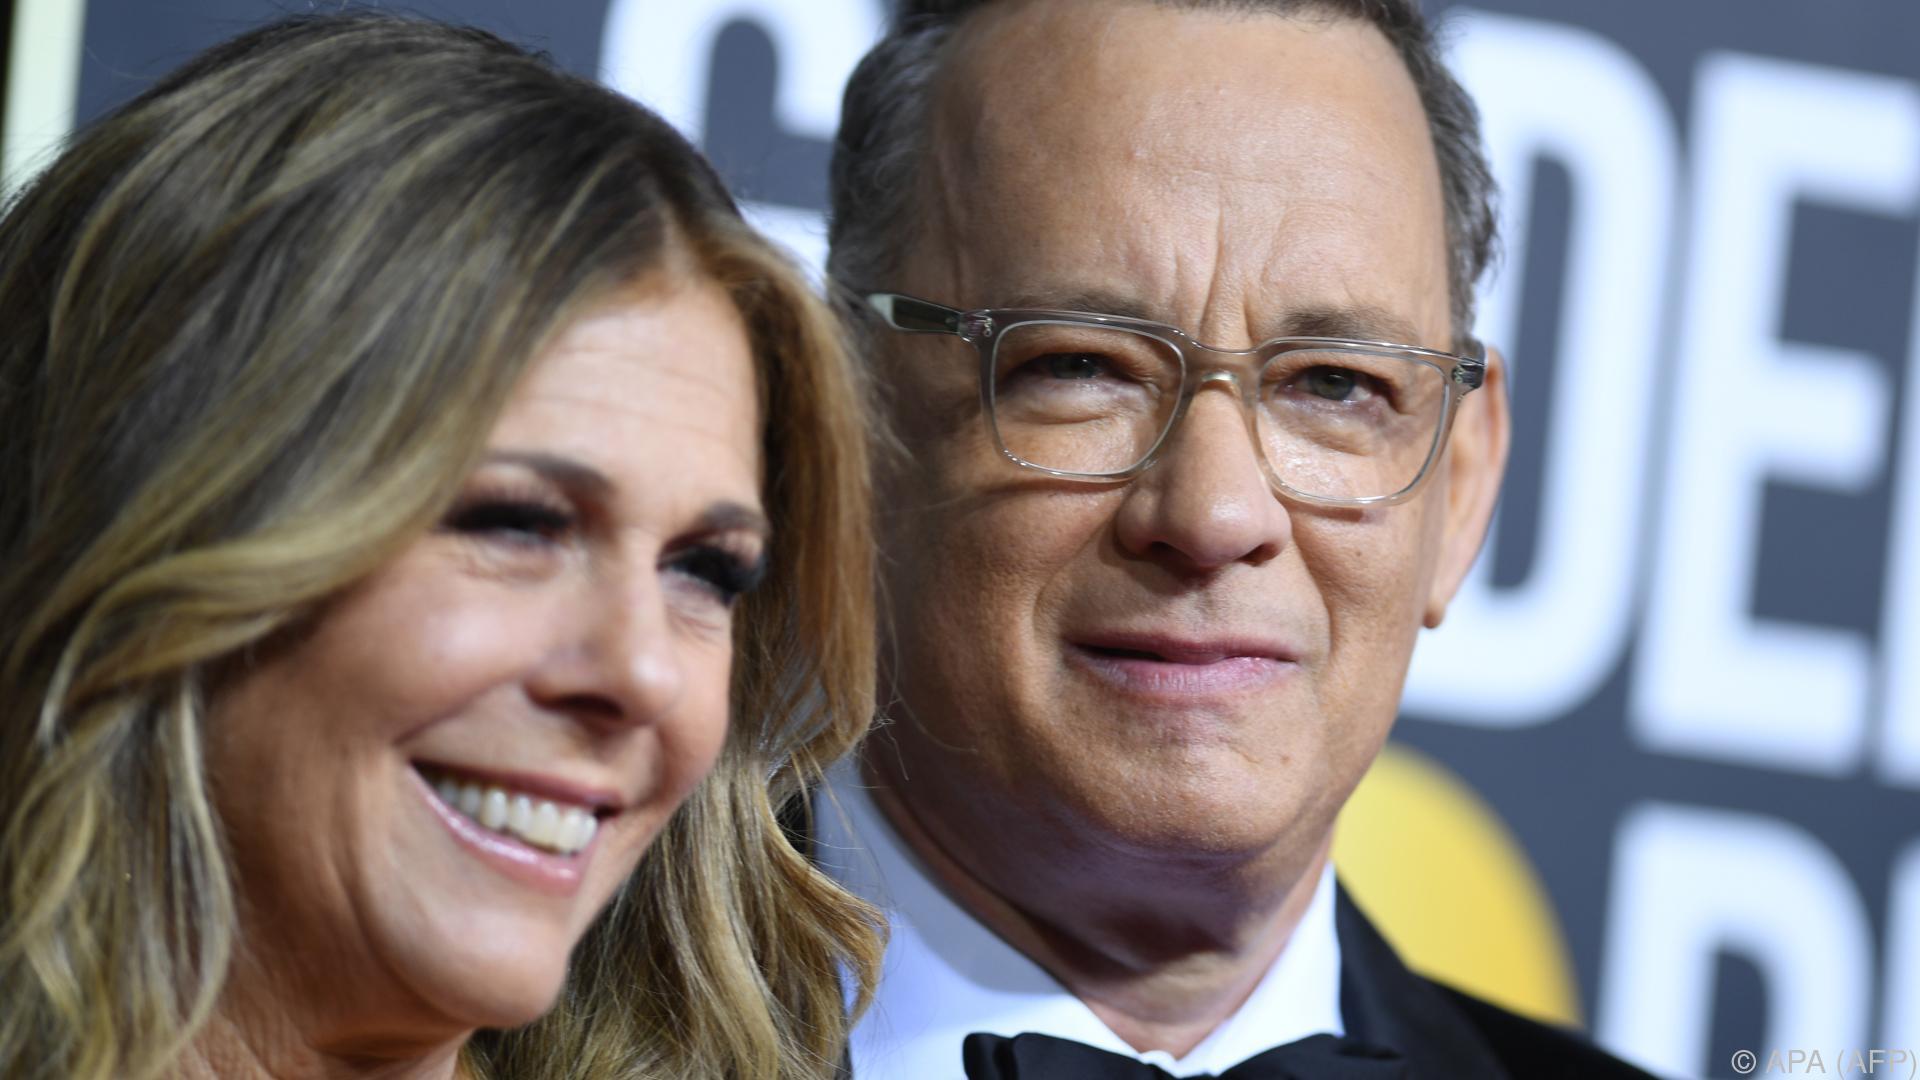 Tom Hanks gratulierte Highschool-Absolventen